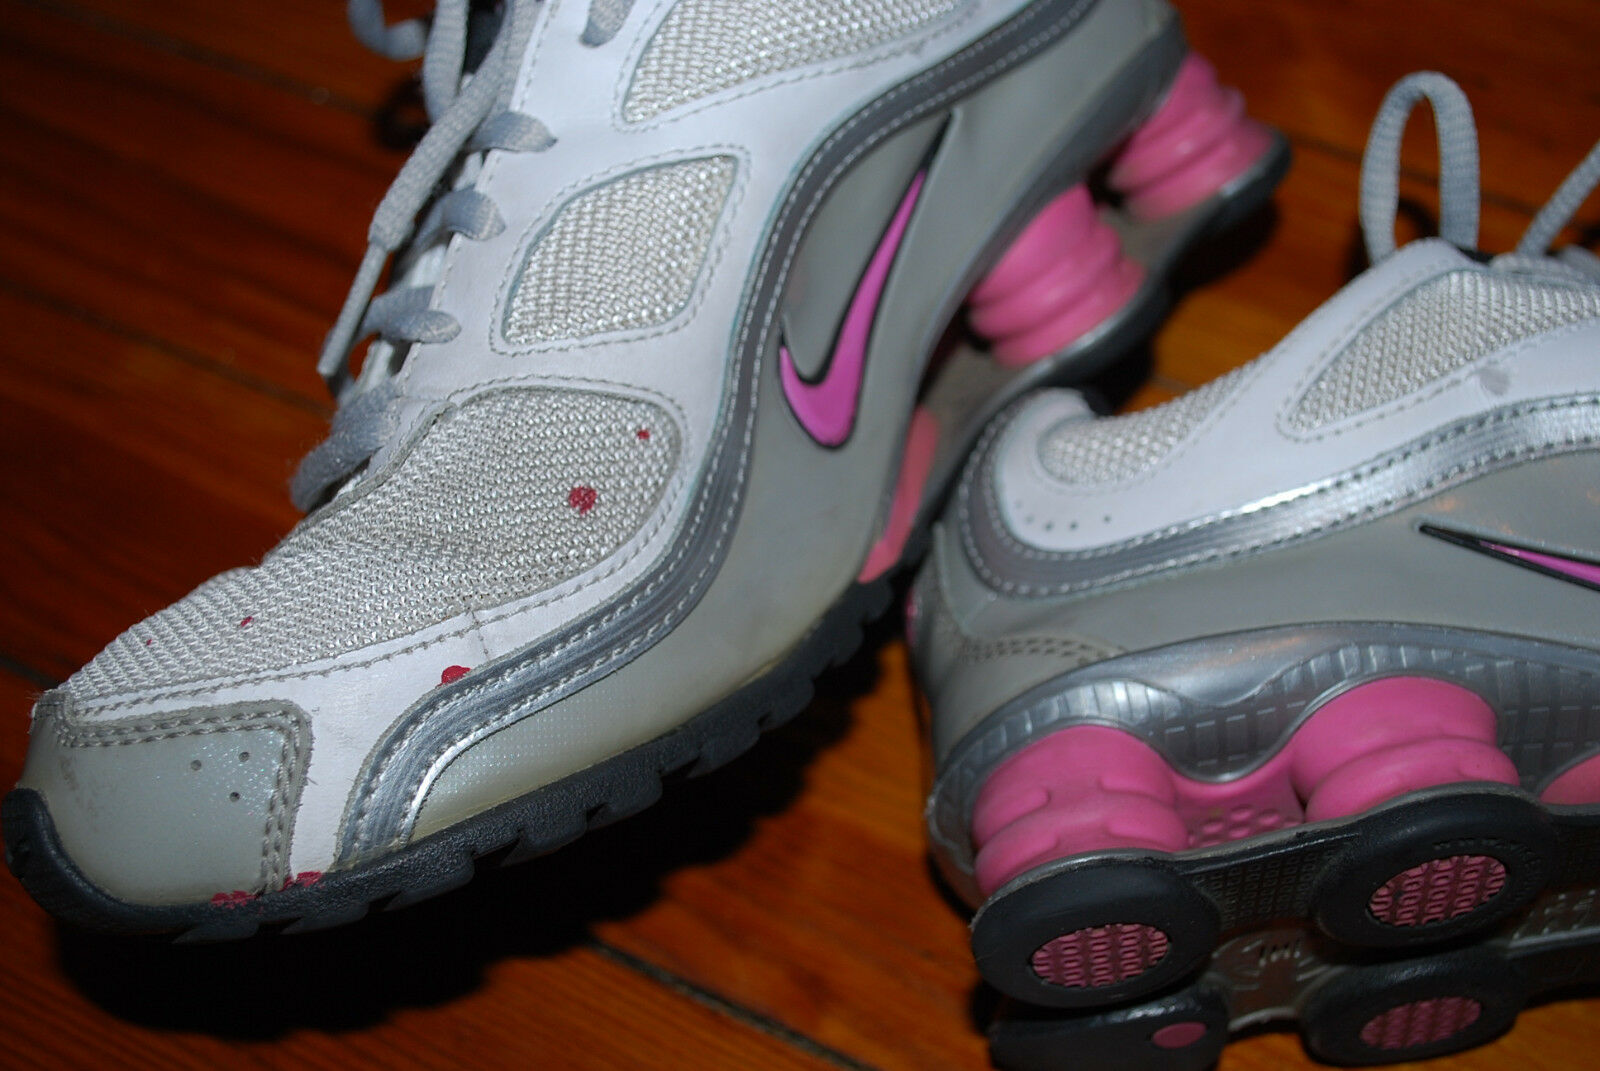 big sale f4443 1e2e0 ... Women s Nike Shox Turbo 9 Pink Gray Running Running Running Sneaker  (5.5) 1315a1